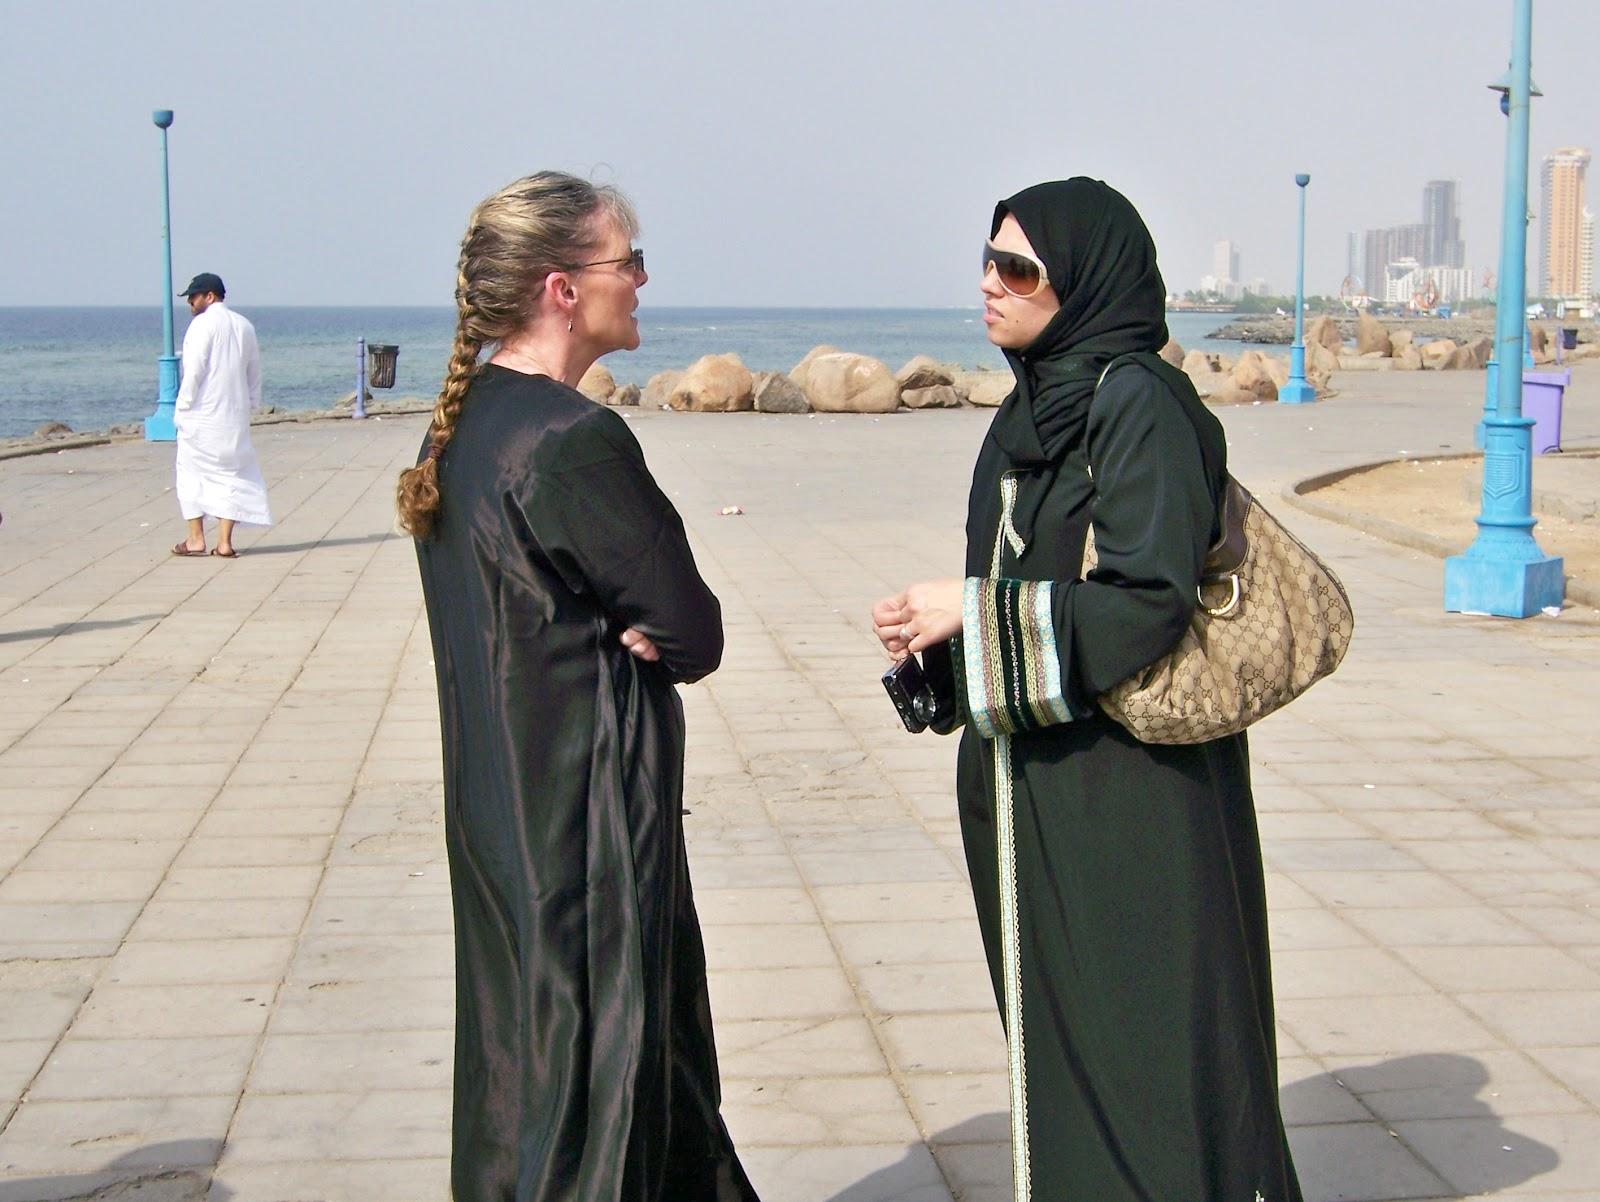 al khobar muslim personals Al-khobar online dating for al-khobar singles 1,500,000 daily active members.